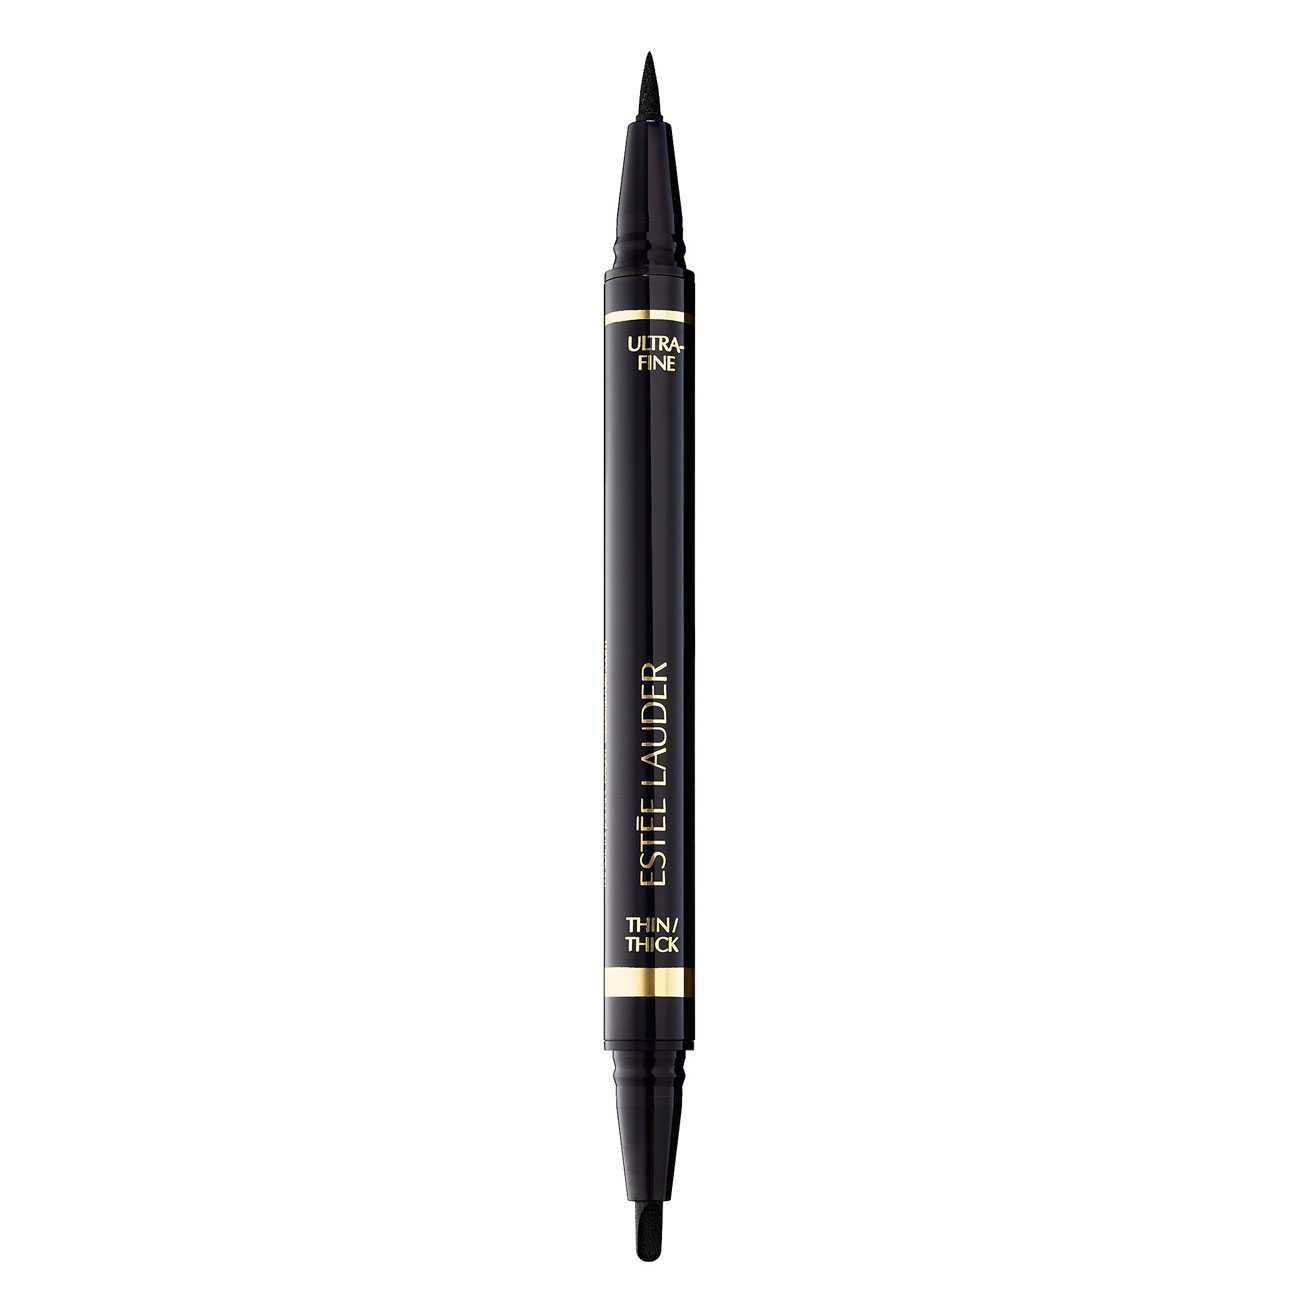 LITTLE BLACK LINER 0.9 G poza noua